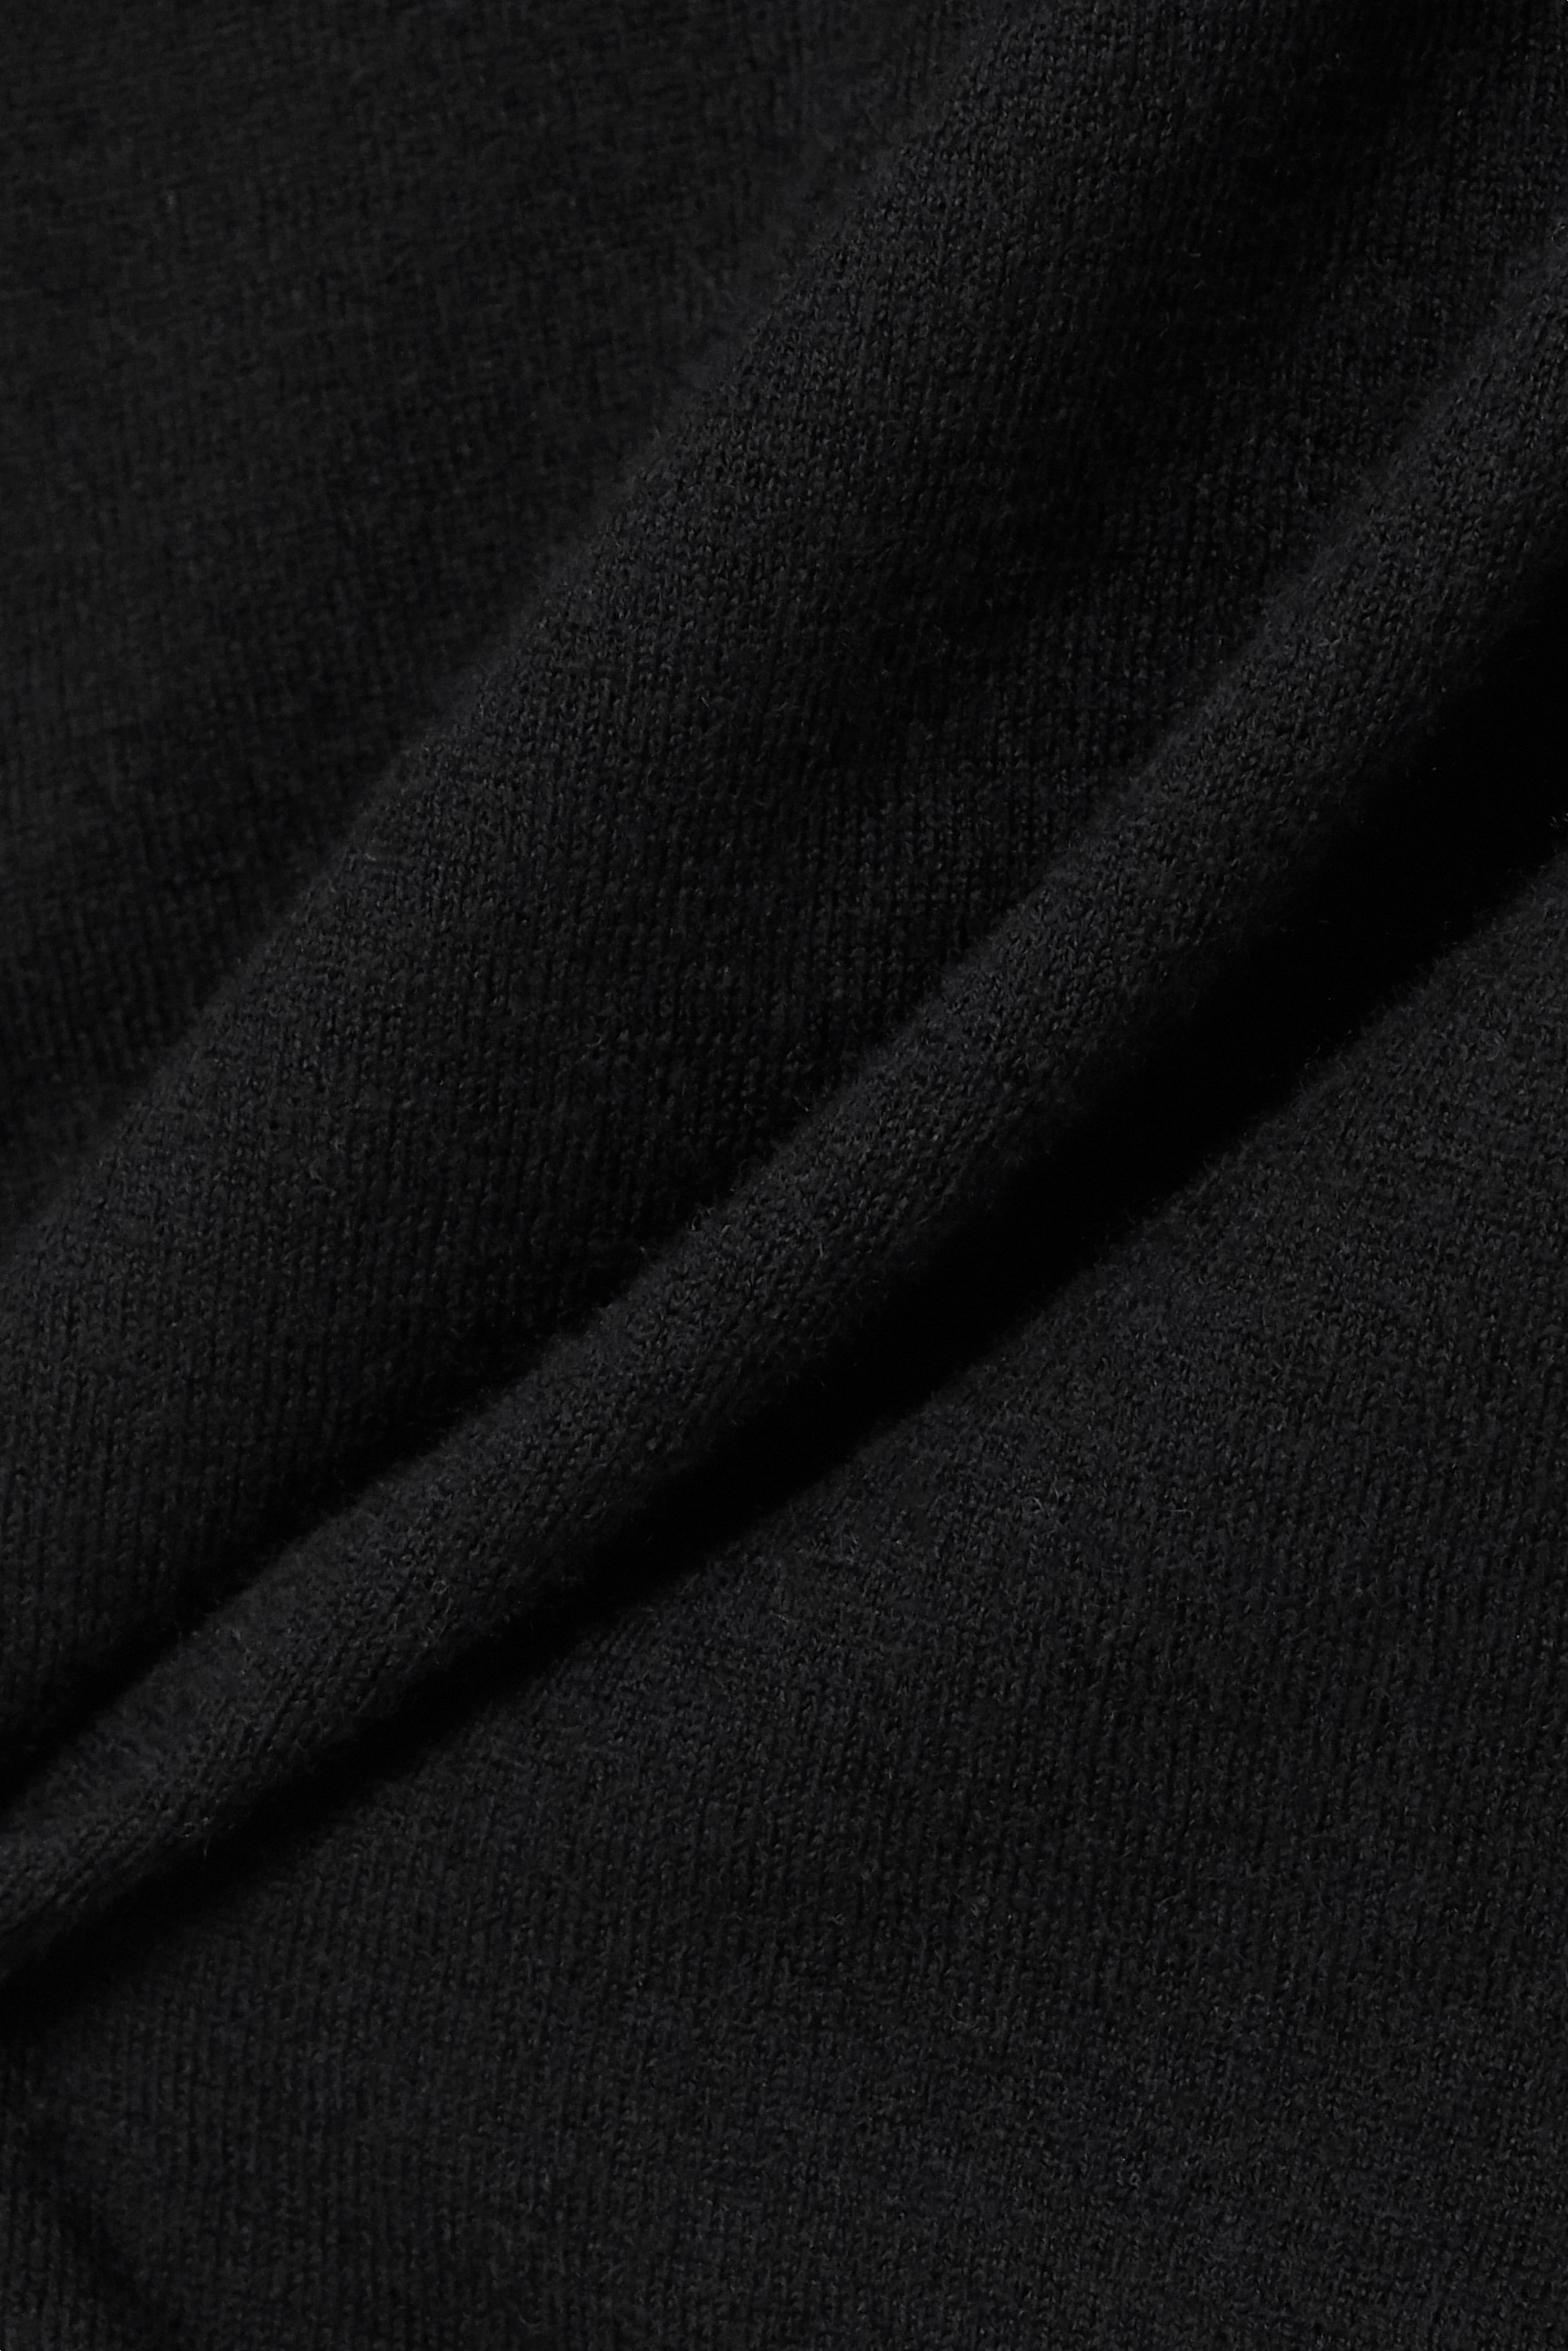 LOULOU STUDIO Prince ärmelloser Pullover aus einer Woll-Kaschmirmischung